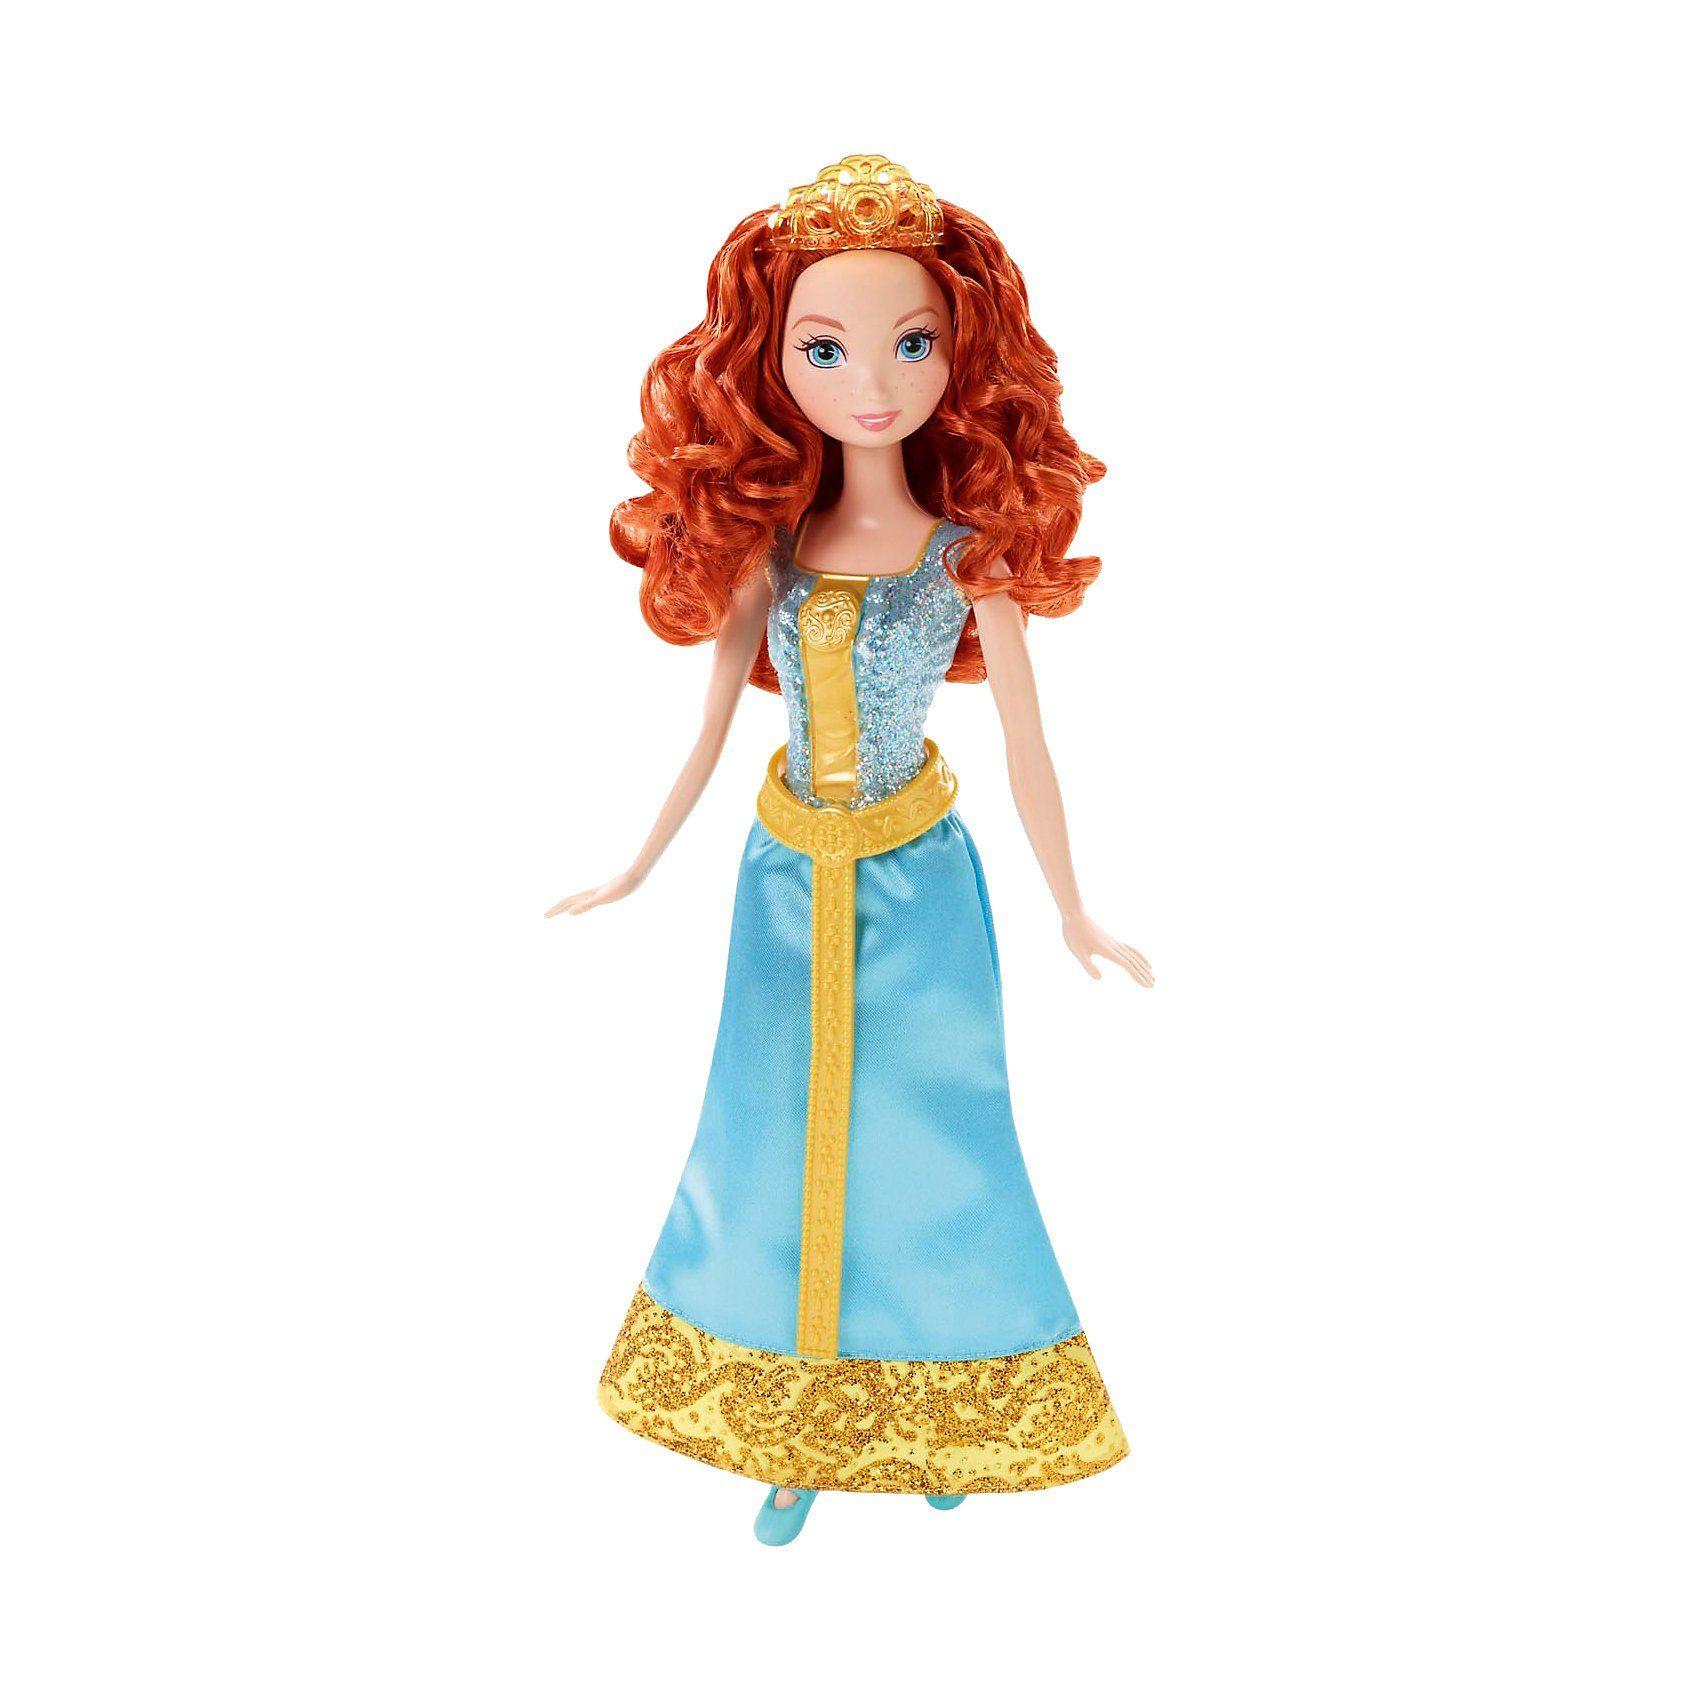 Mattel Märchenglanz Prinzessin Merida